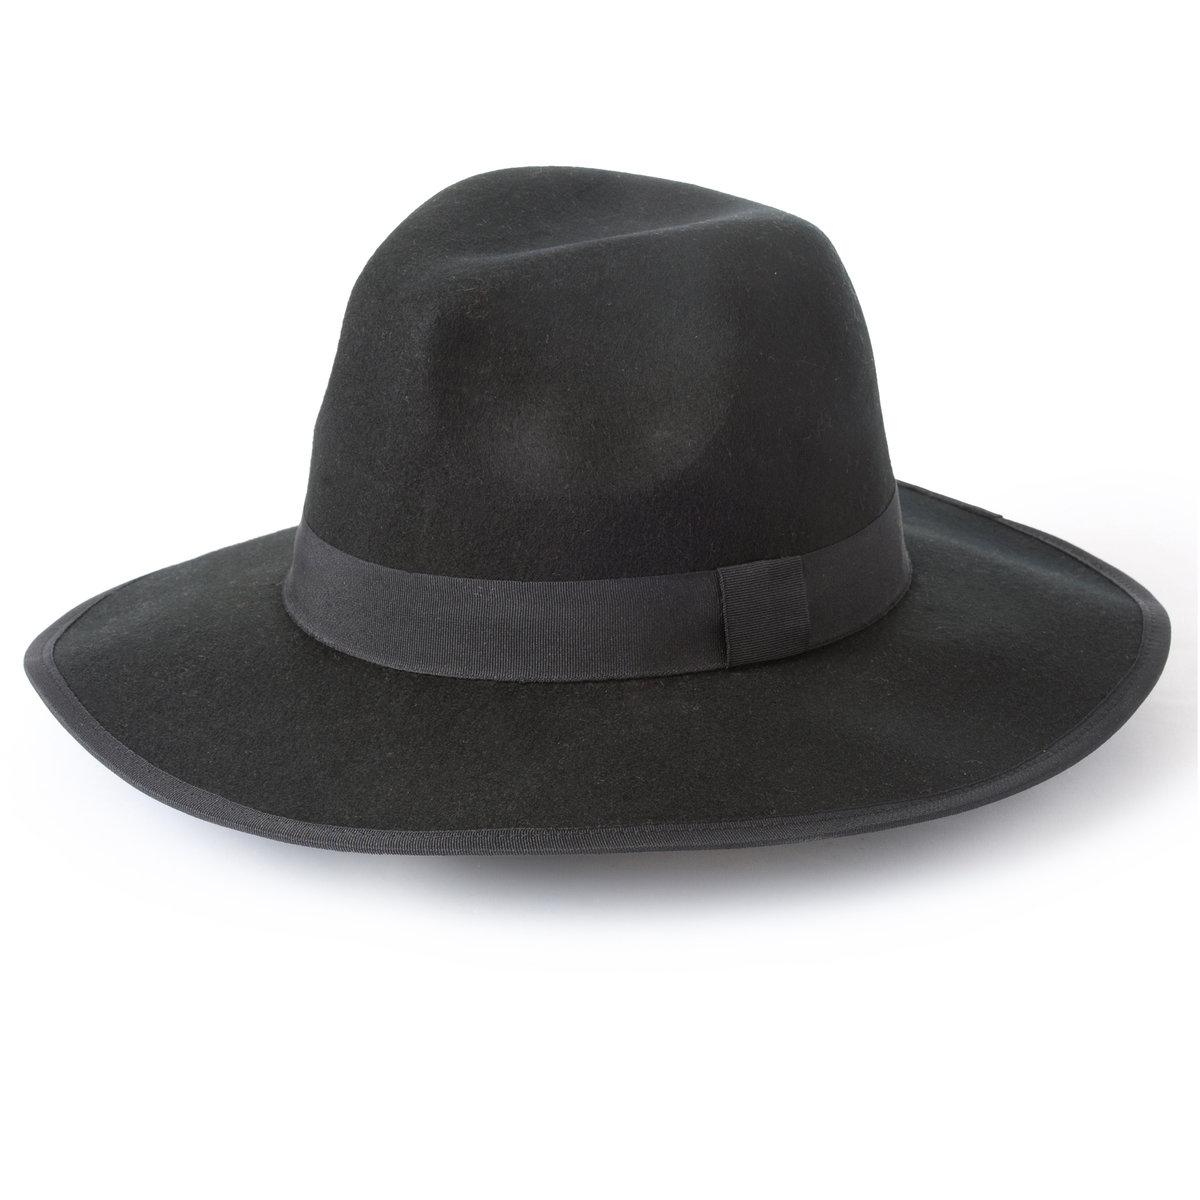 Шляпа из цветного войлока, 100% шерсти от La Redoute